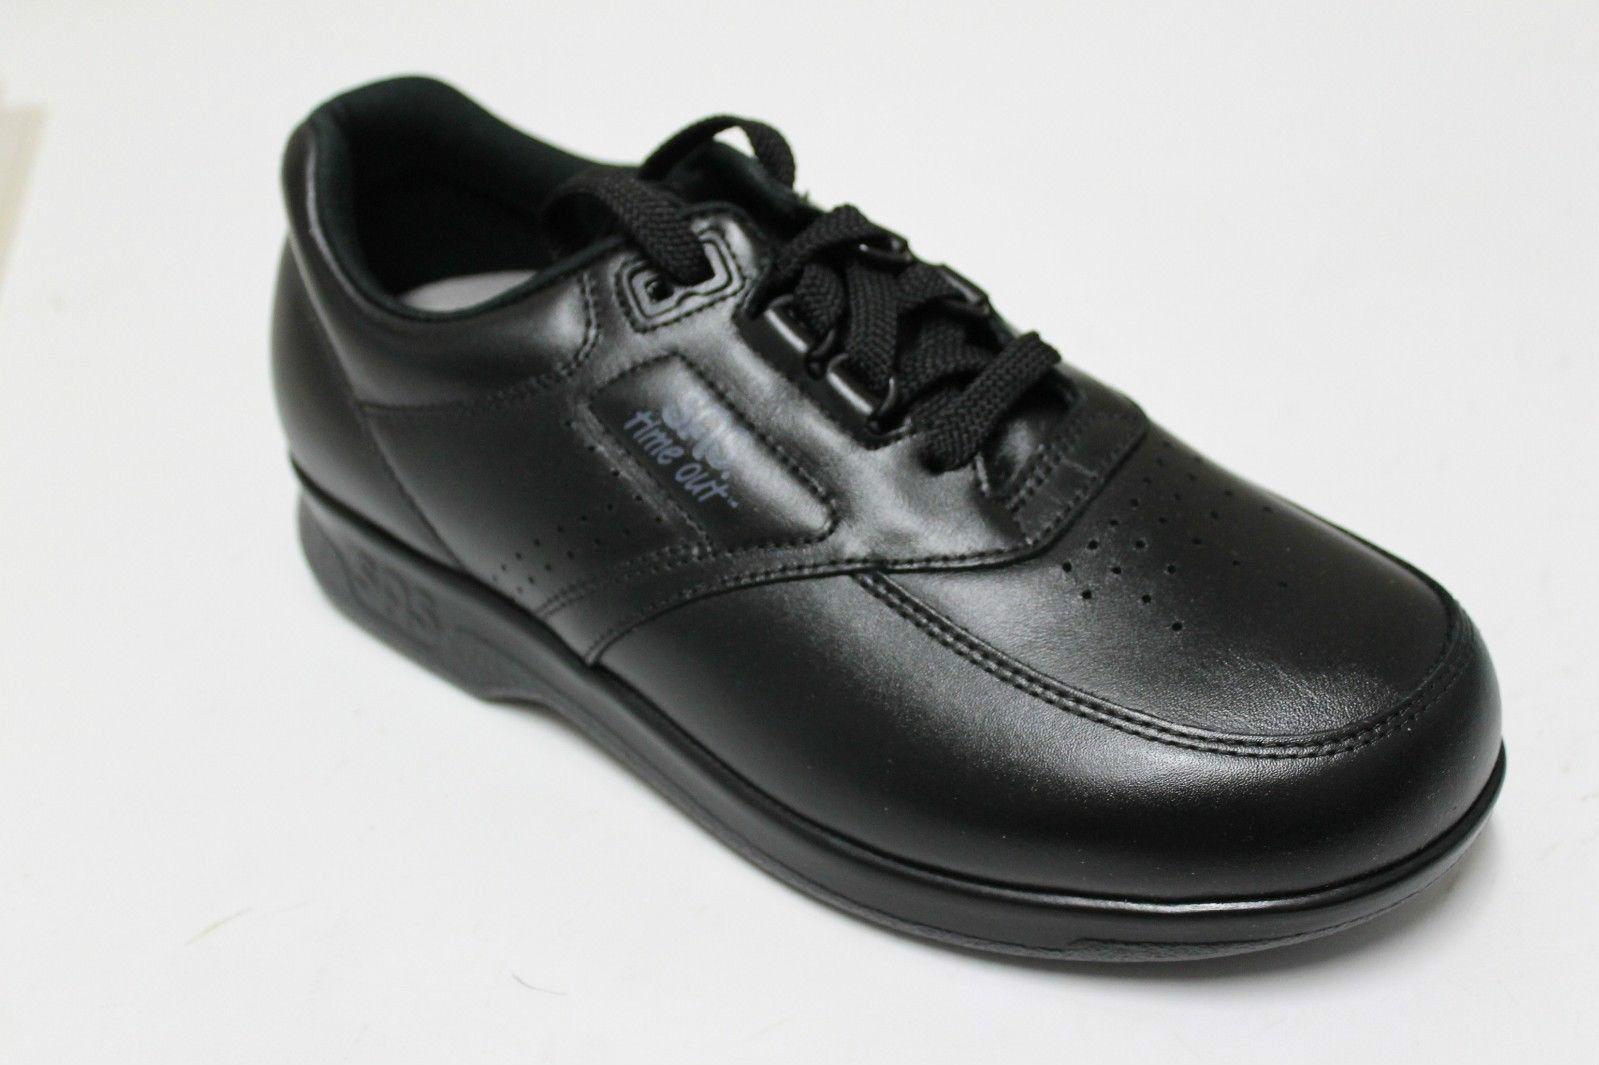 SAS Men's Time Out Tripad Orthopedic Lace-Up Comfort shoes